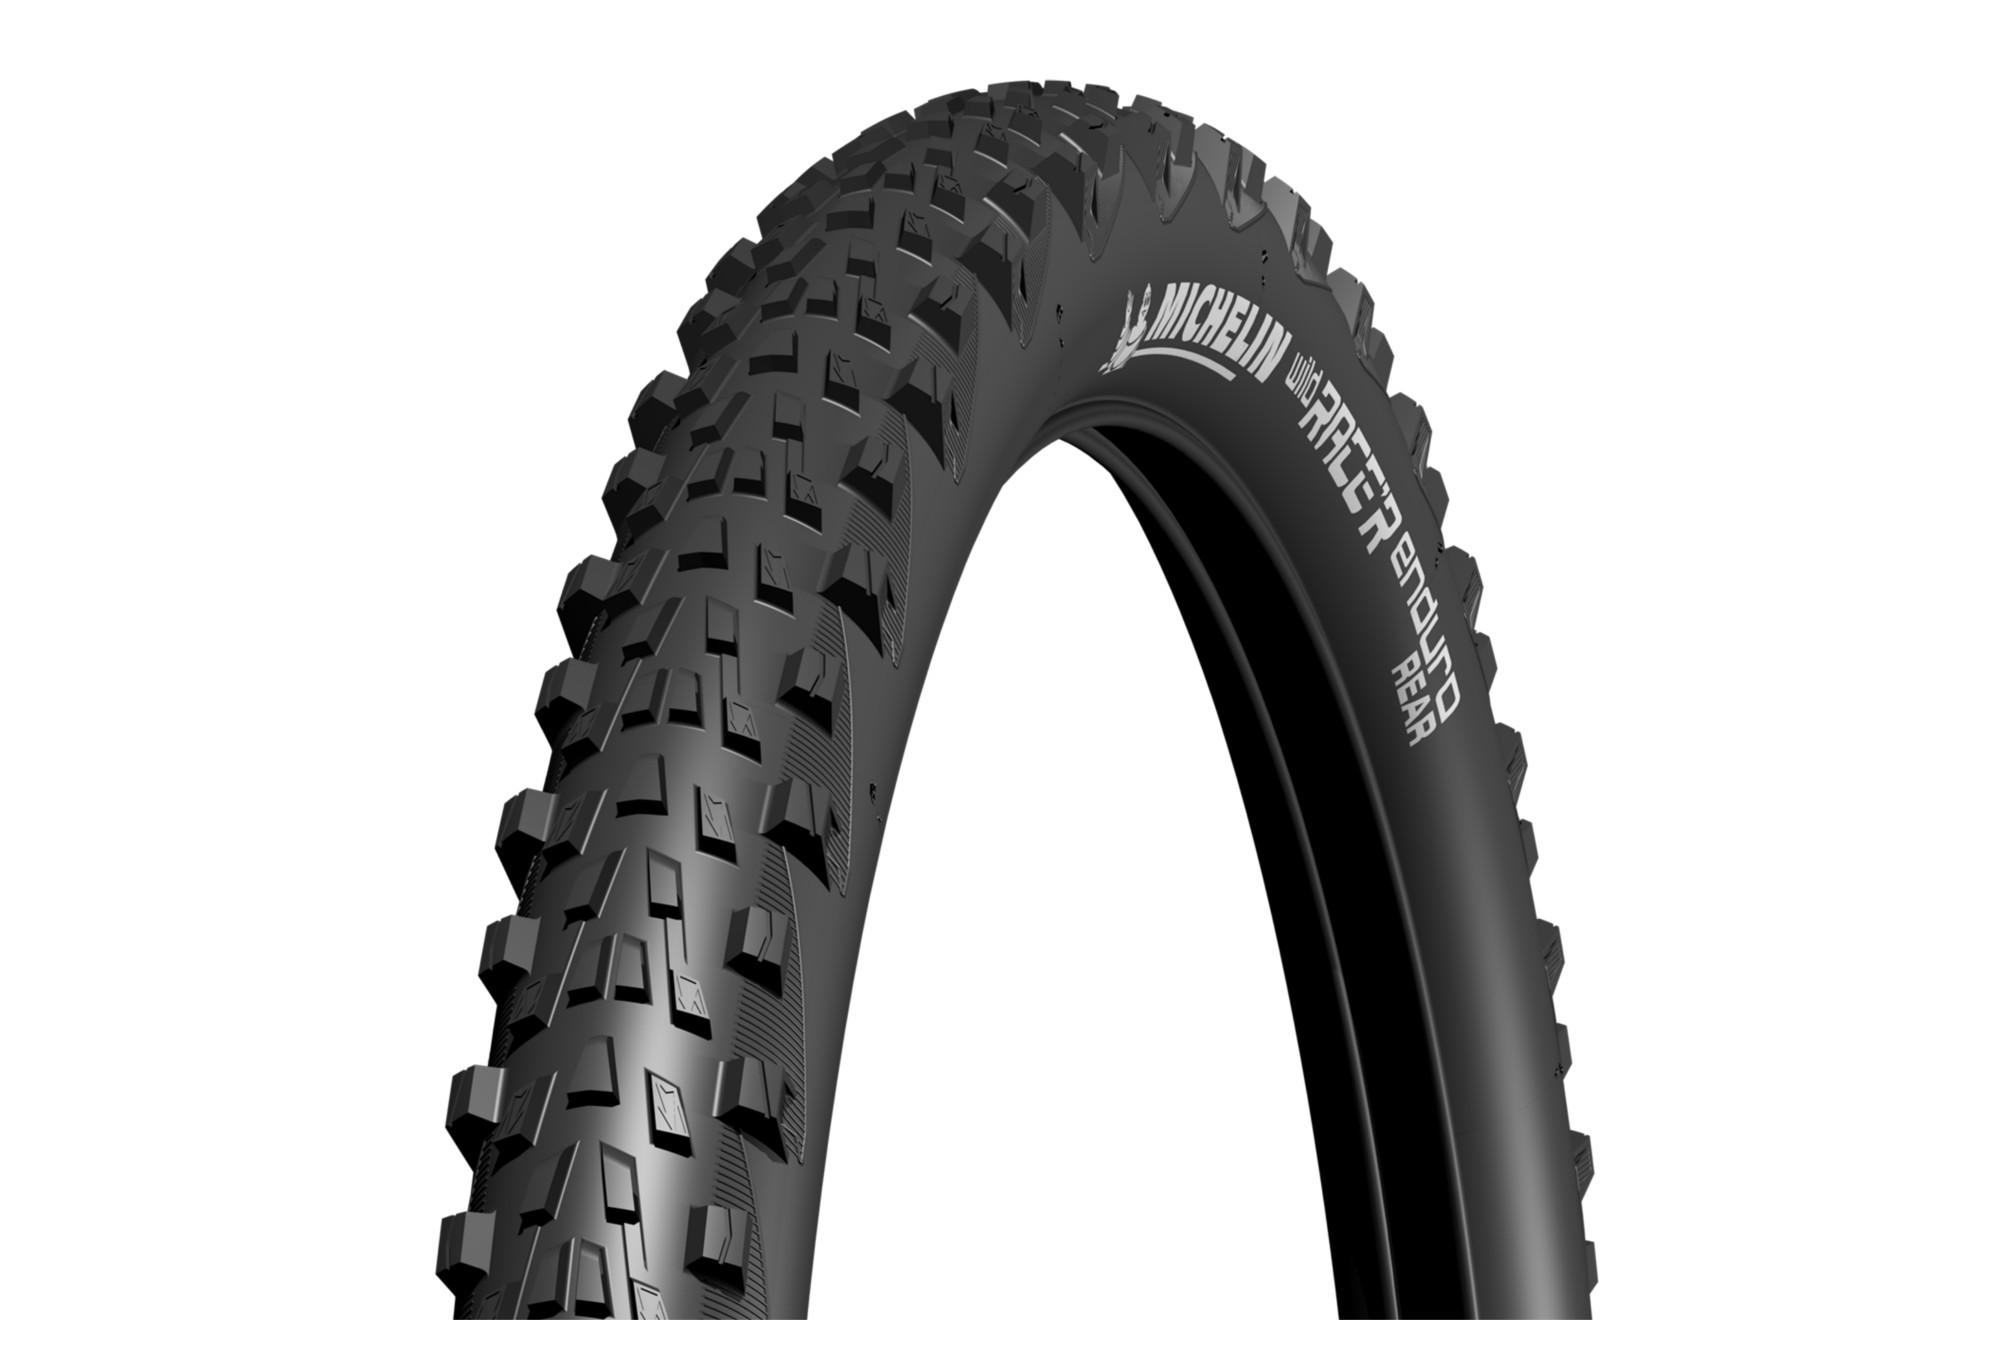 Pneu D été >> Pneu Enduro Michelin Wild Race R Enduro Rear 27 5 Gum X Tubeless